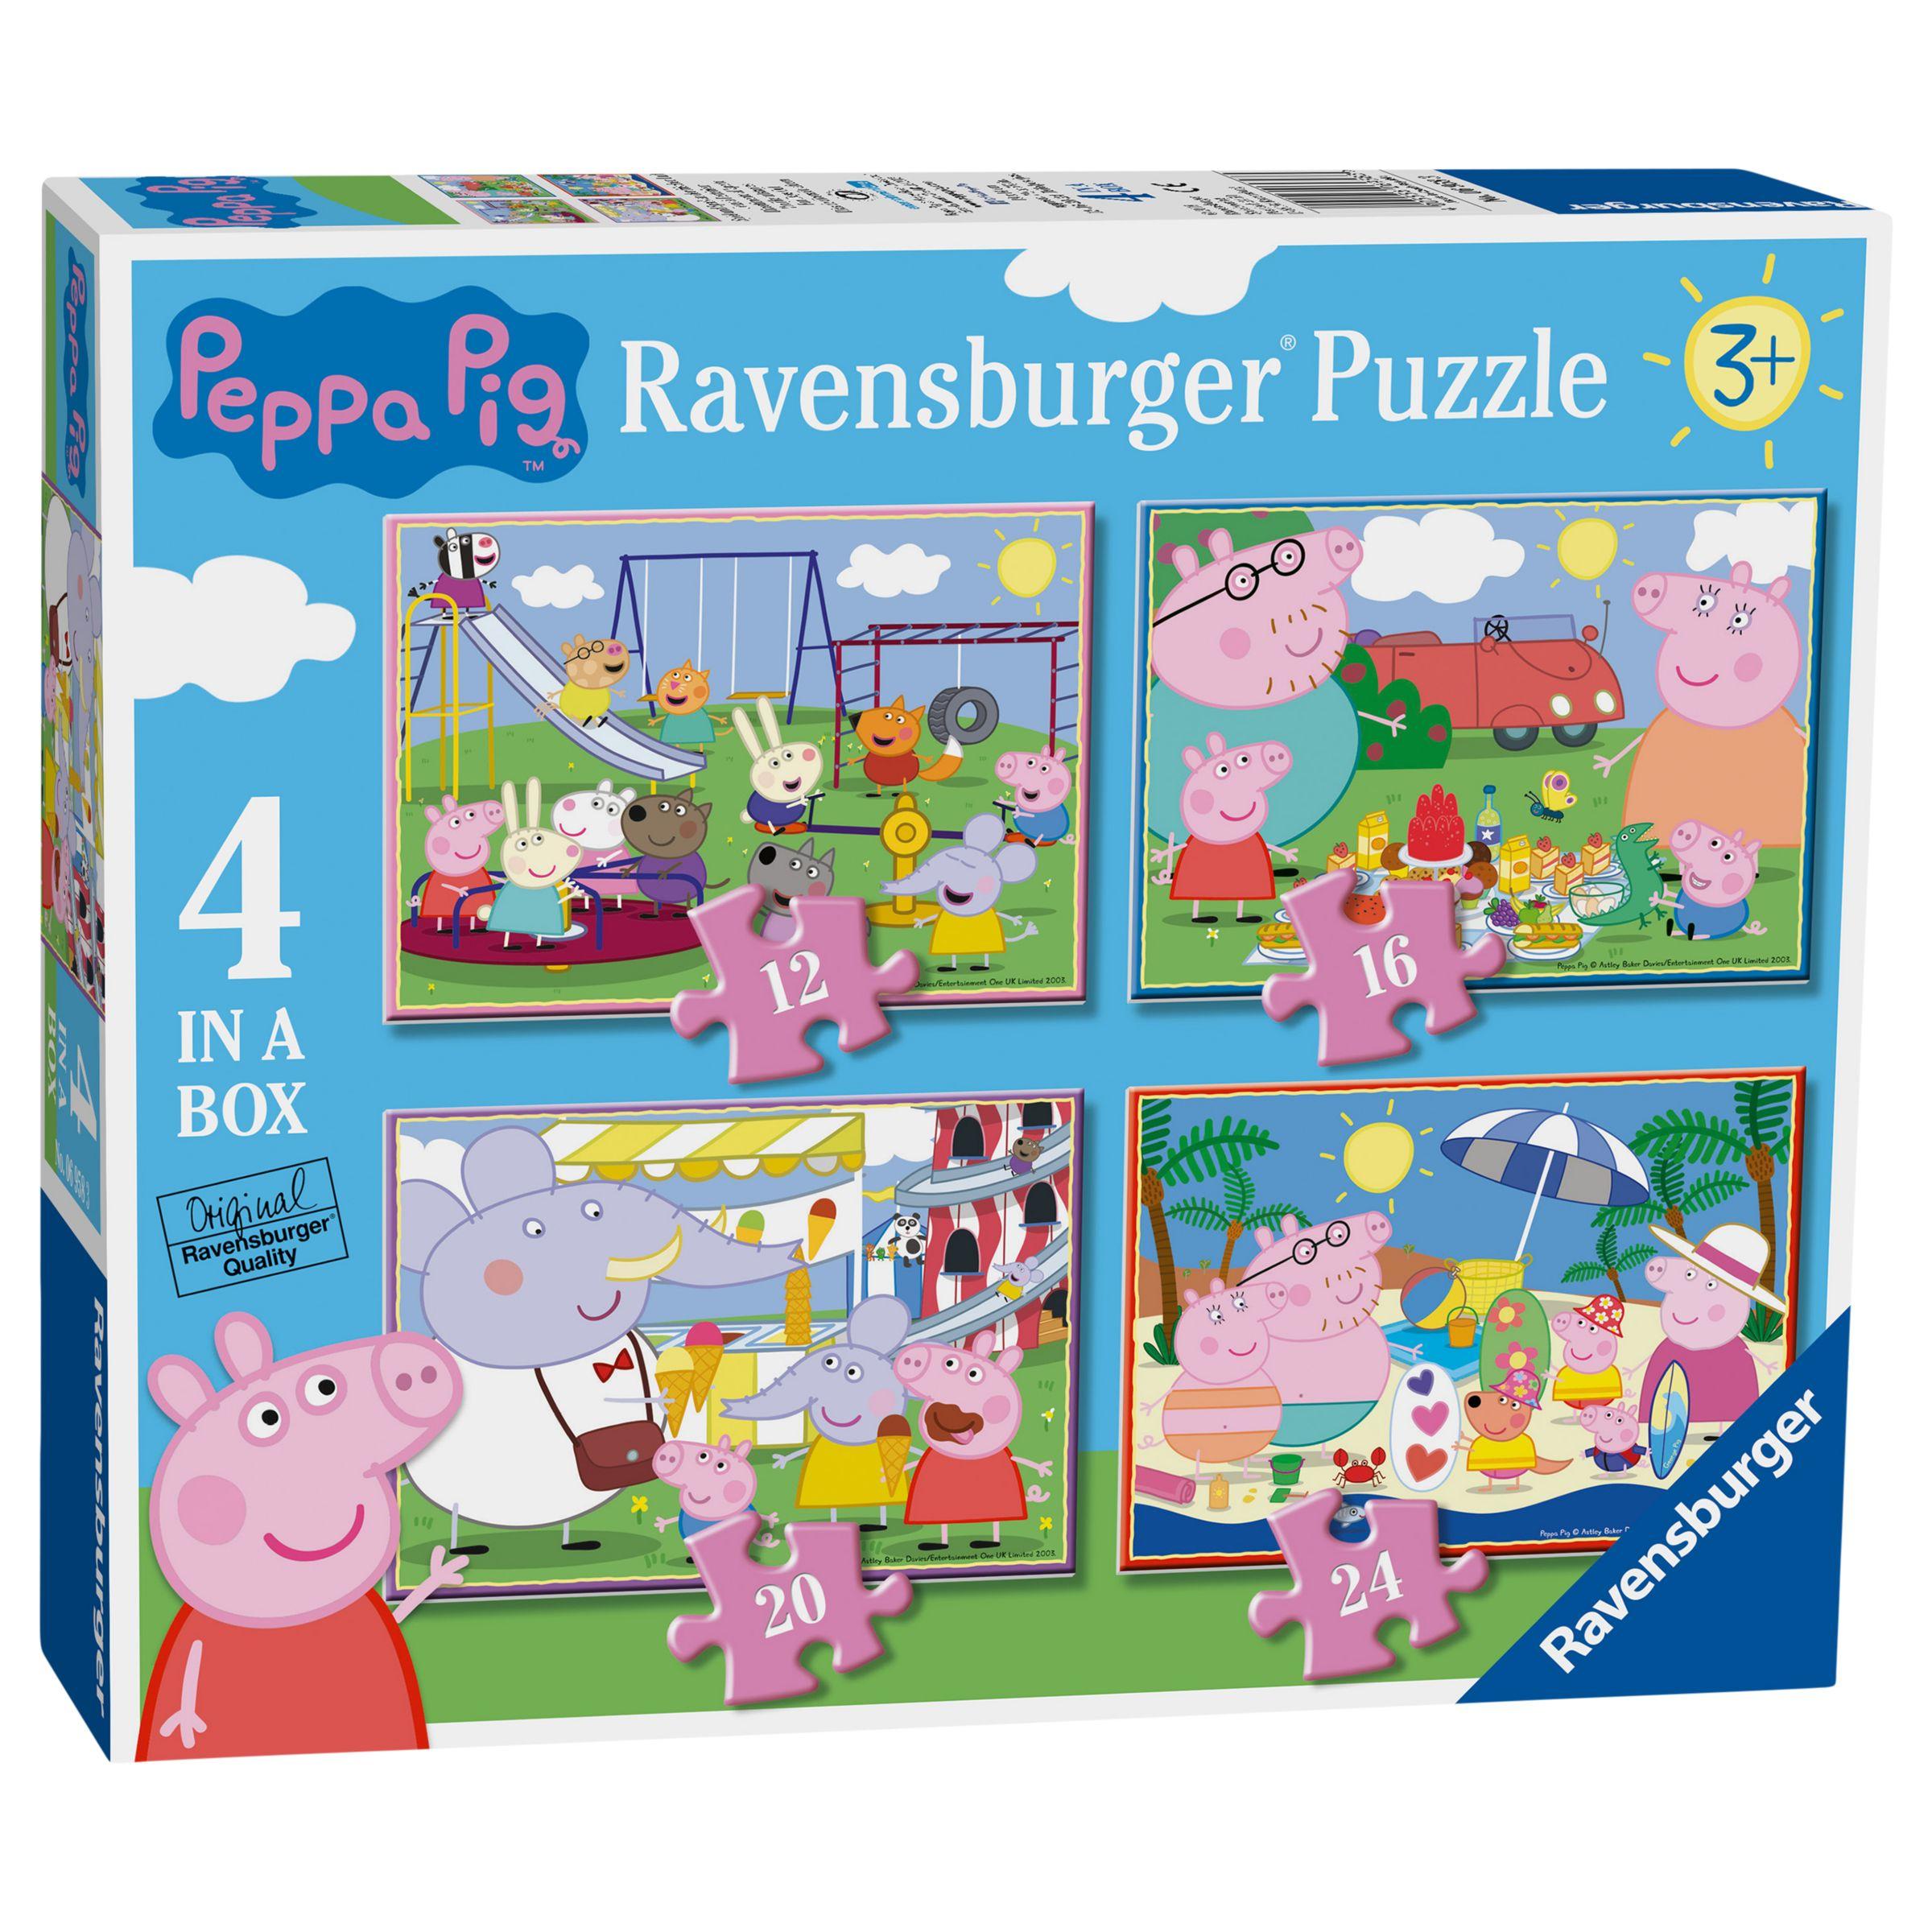 Peppa Pig Peppa Pig Ravensburger 4 In a Box Jigsaw Puzzle